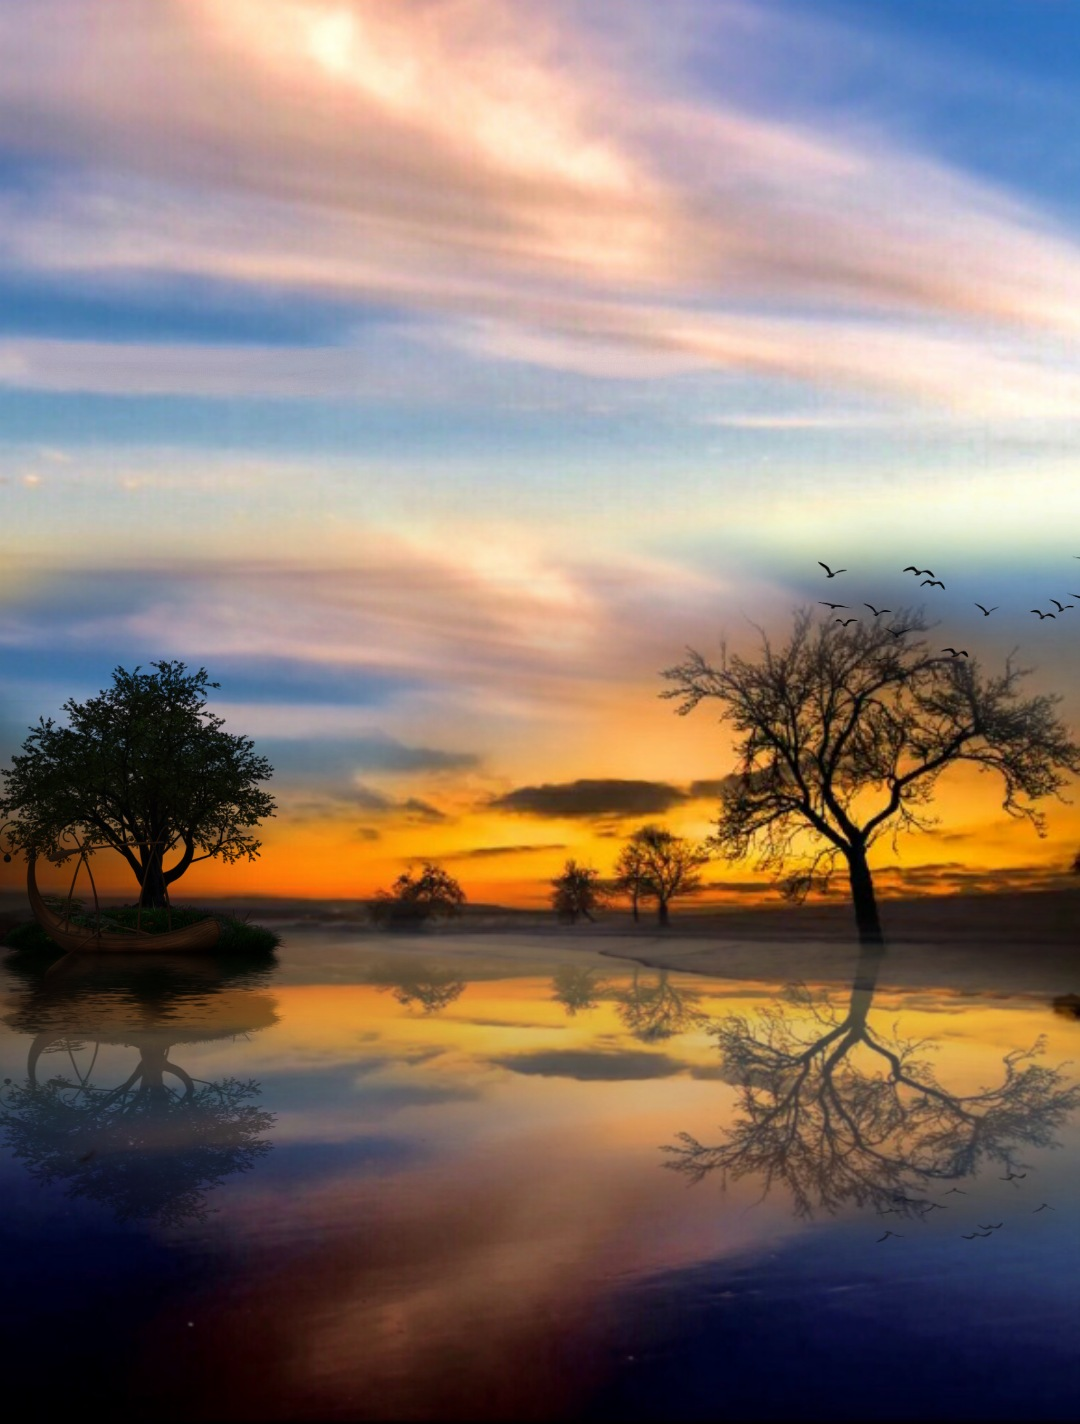 Atardecer 😊Sunset😊 #freetoedit #sky #reflection #sunset #landscape #nature #makeawesome #heypicsart #myedit #araceliss